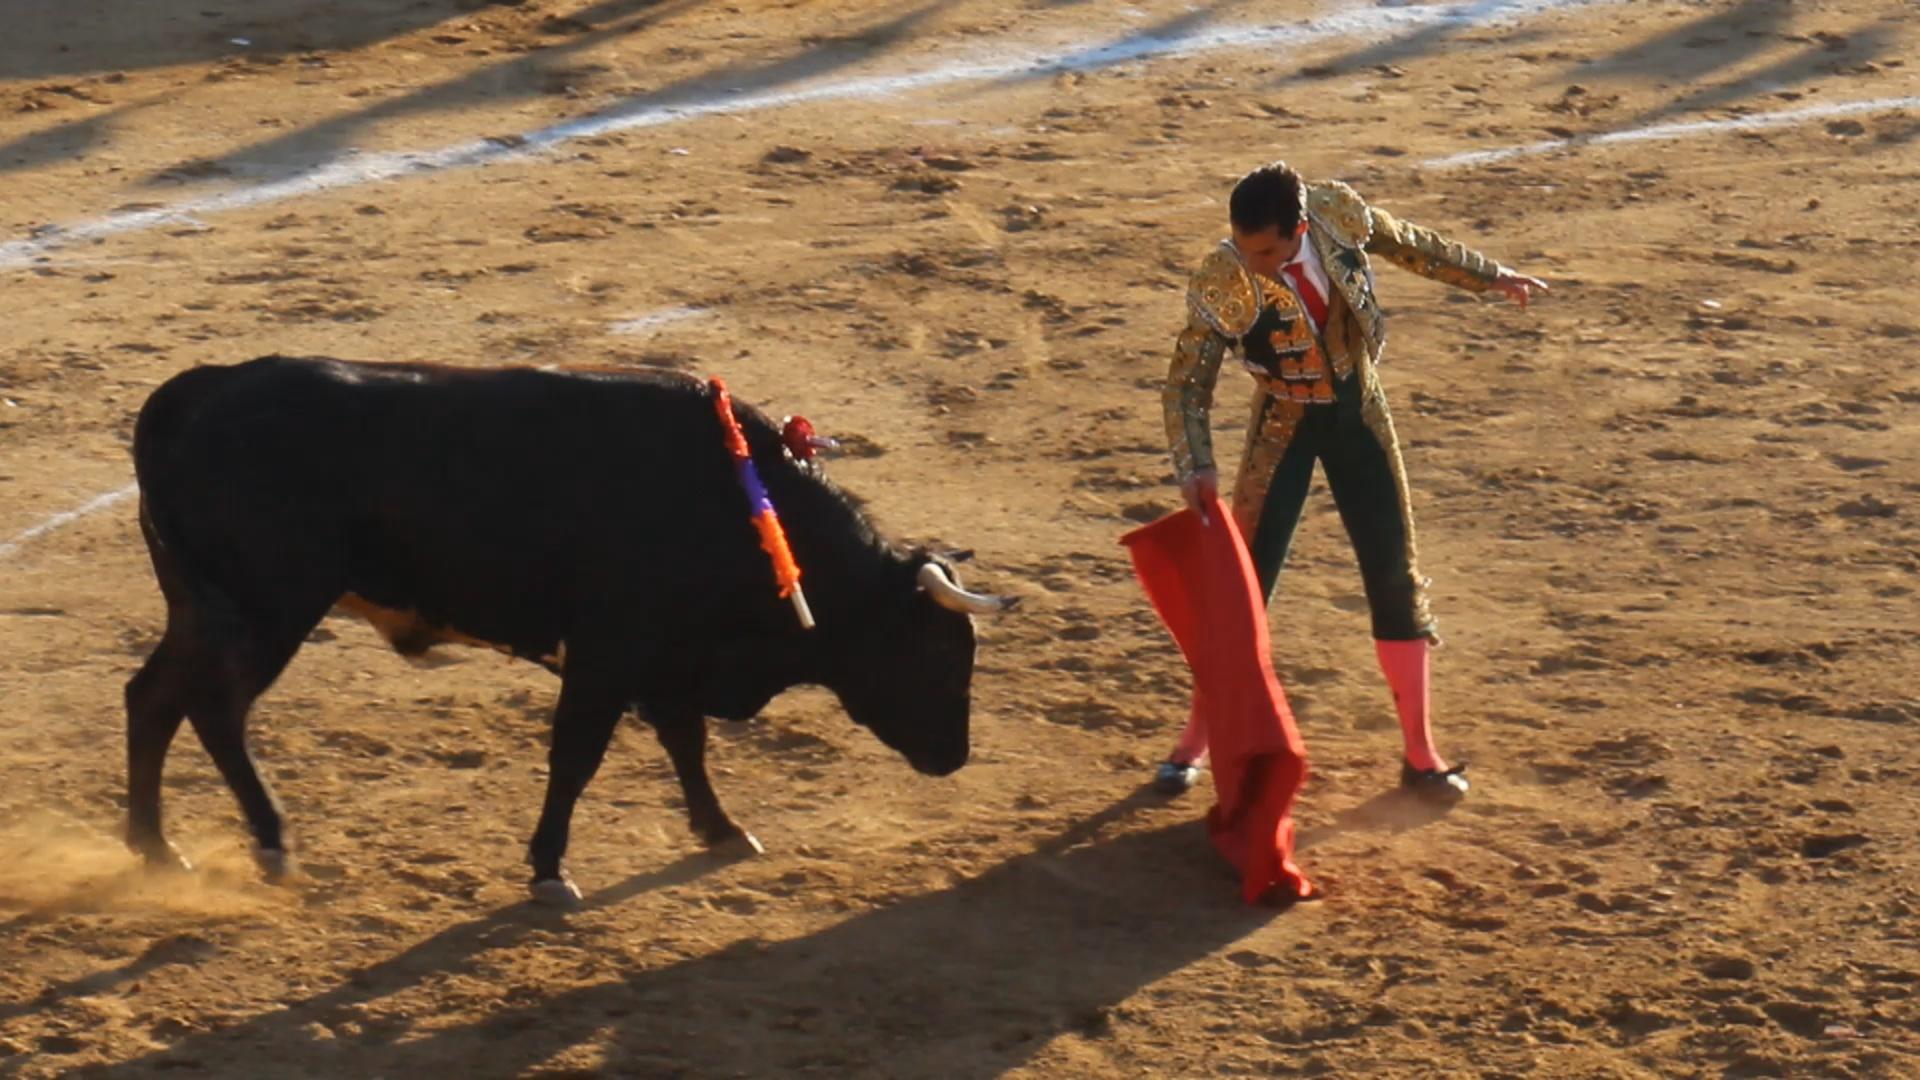 bull fighting 1920x1080 hd - photo #2